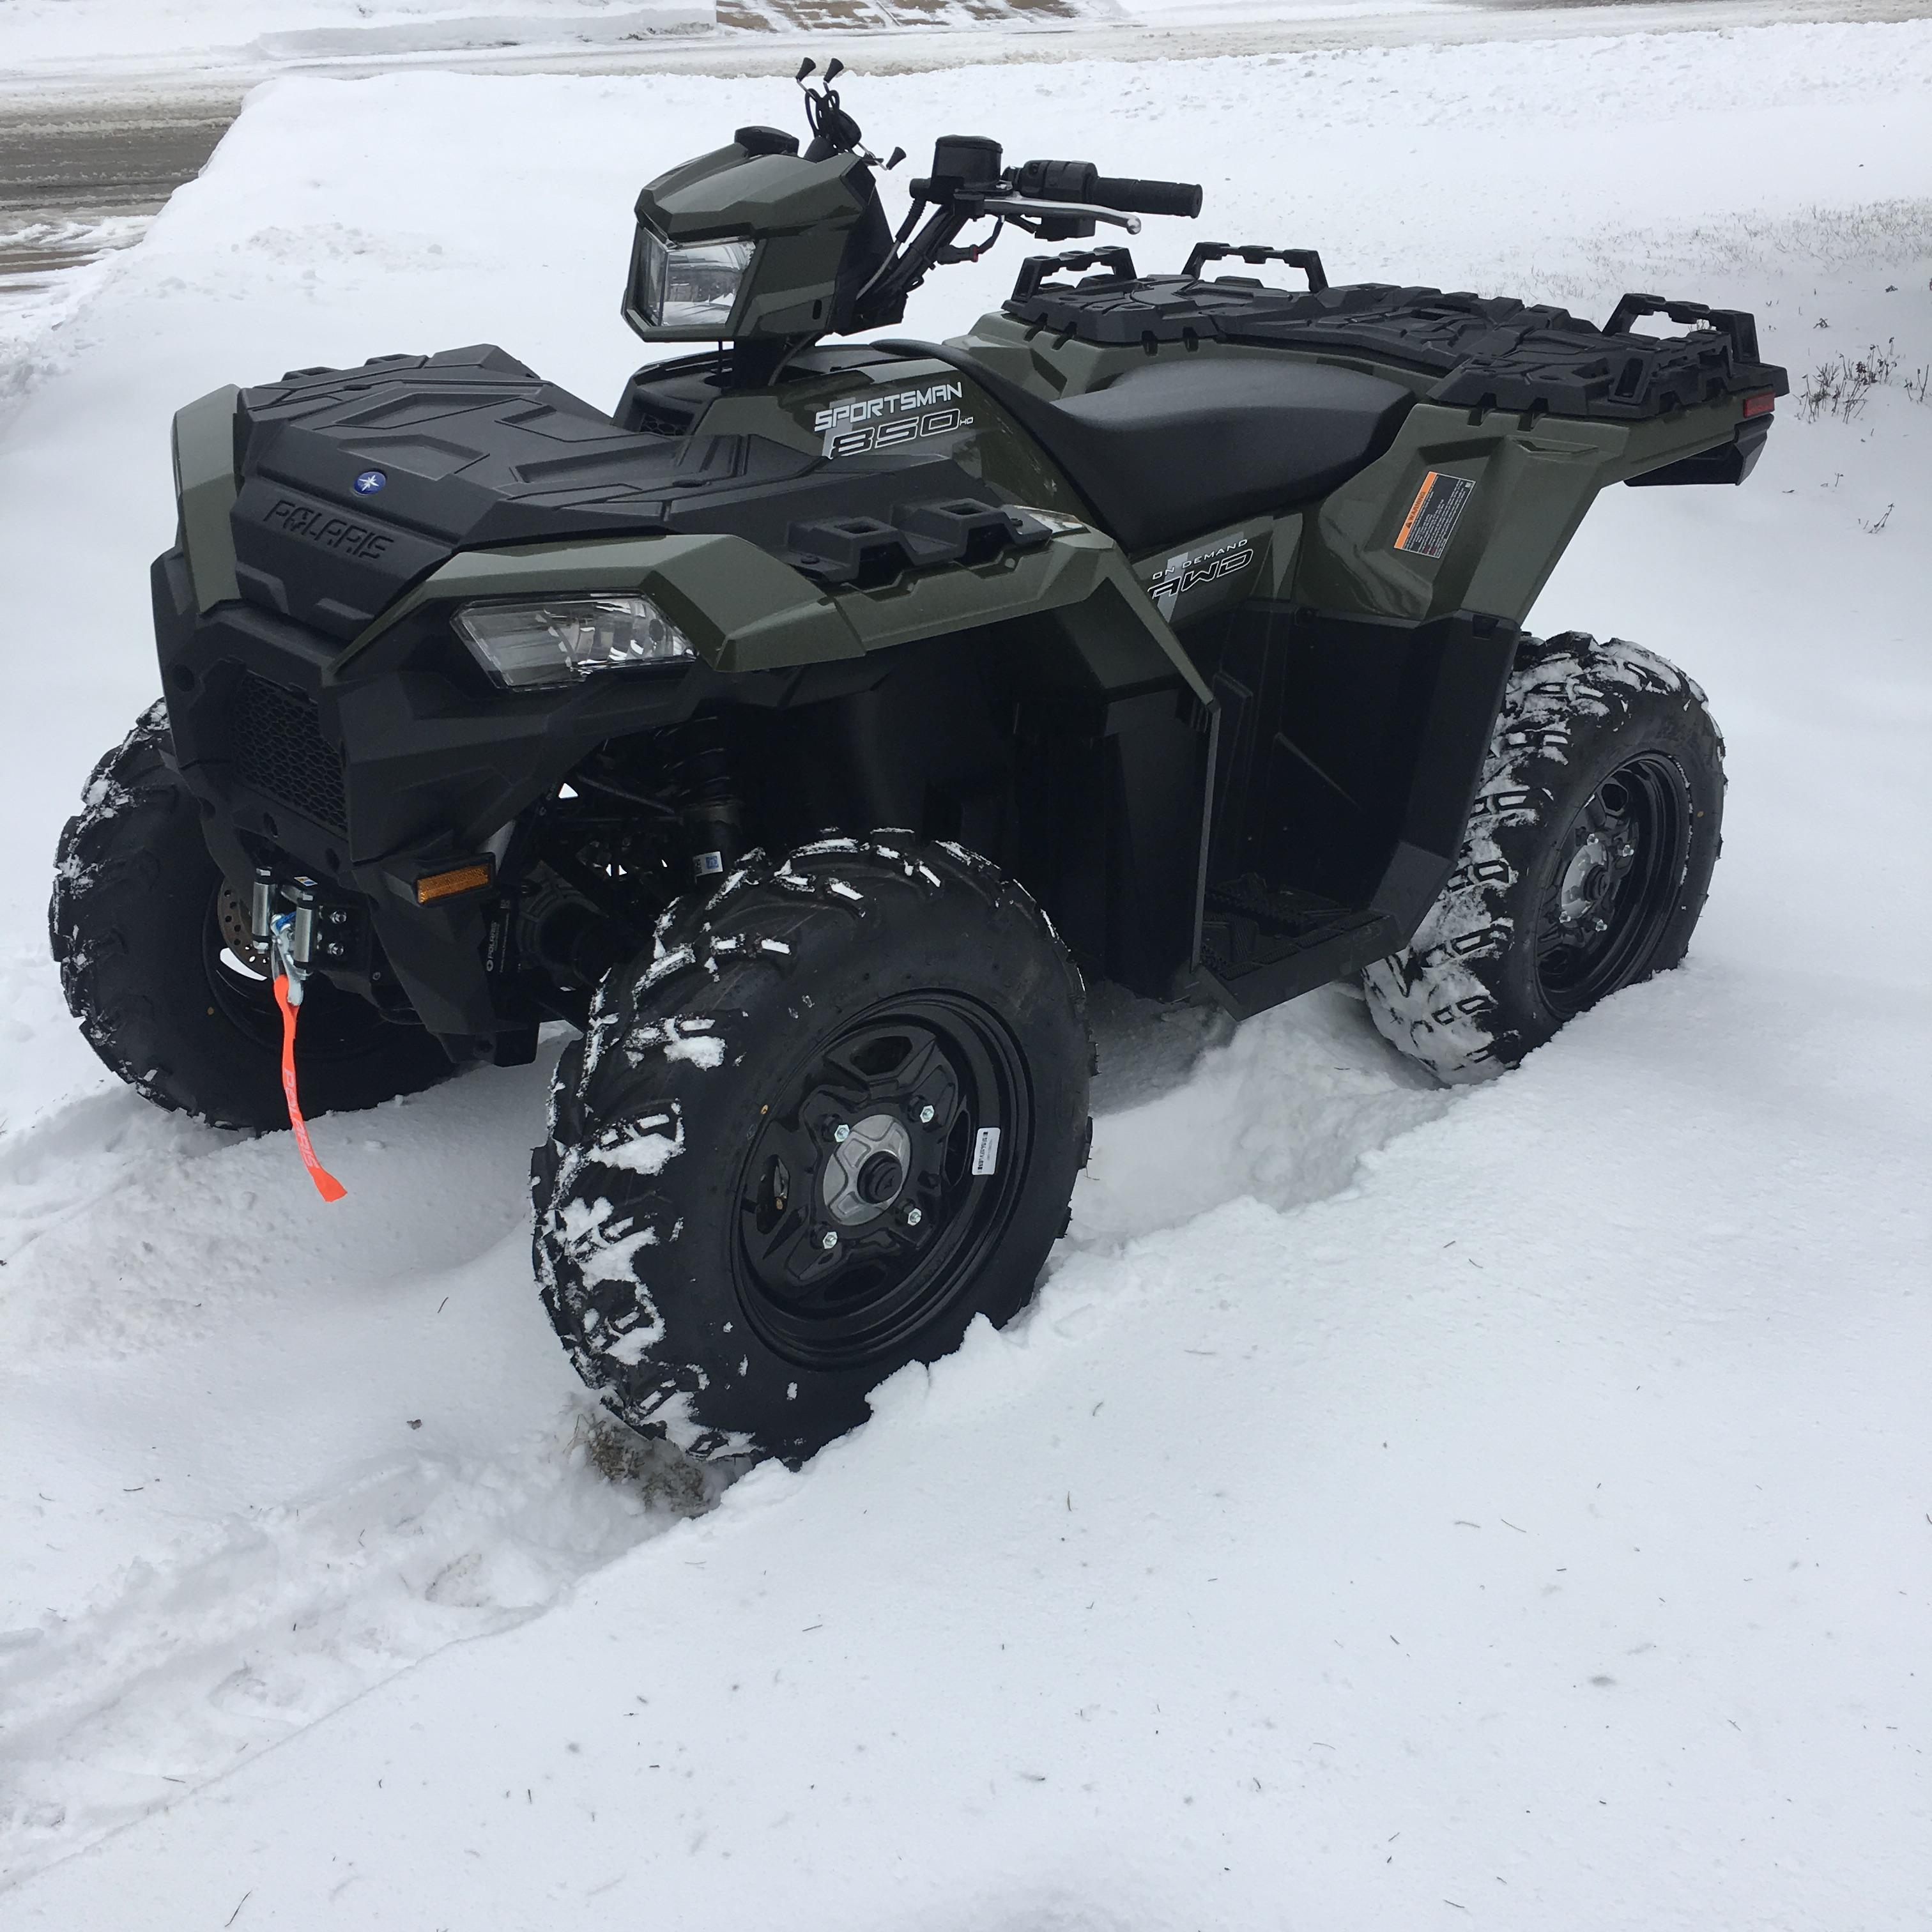 2019 Sportsman 850 Build Polaris Atv Forum